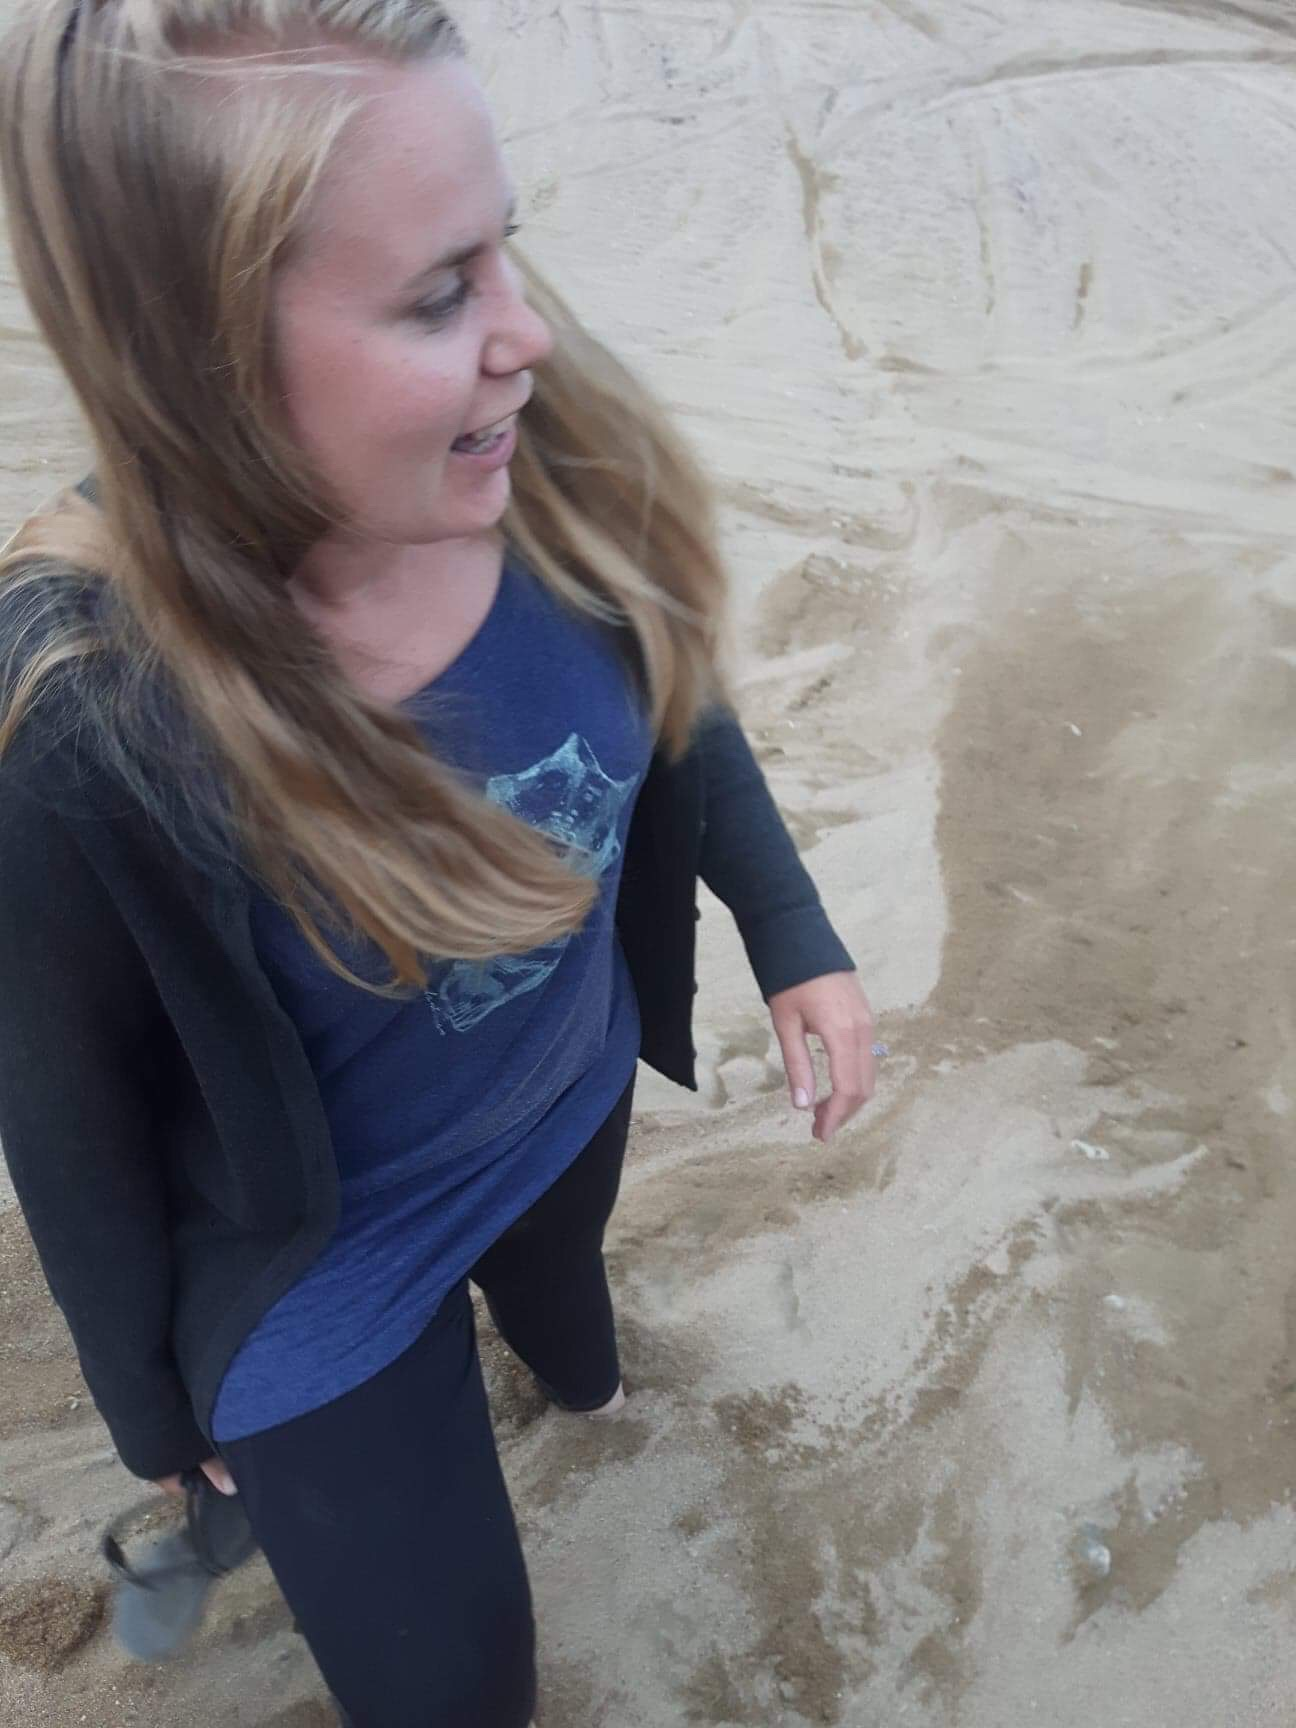 dune-tadoussac-quebec-andreanne-pinard